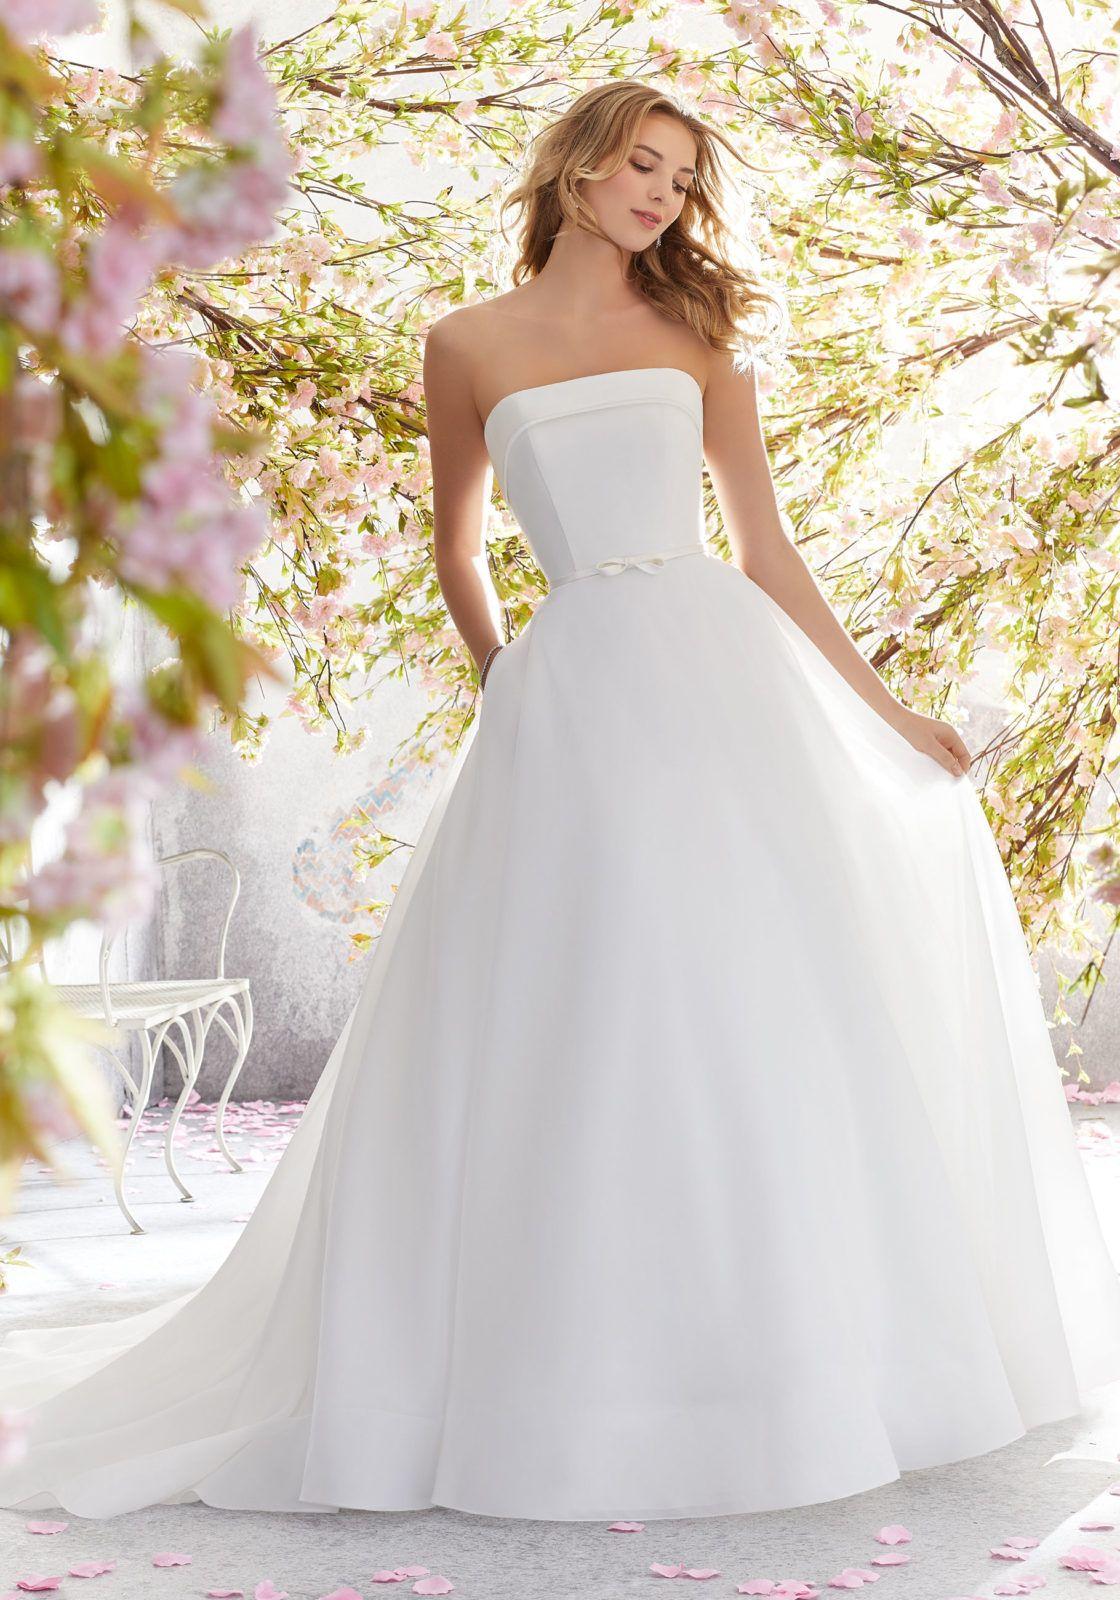 Lucille Wedding Dress Morilee Ball Gowns Wedding Wedding Dress Organza Bridal Dresses